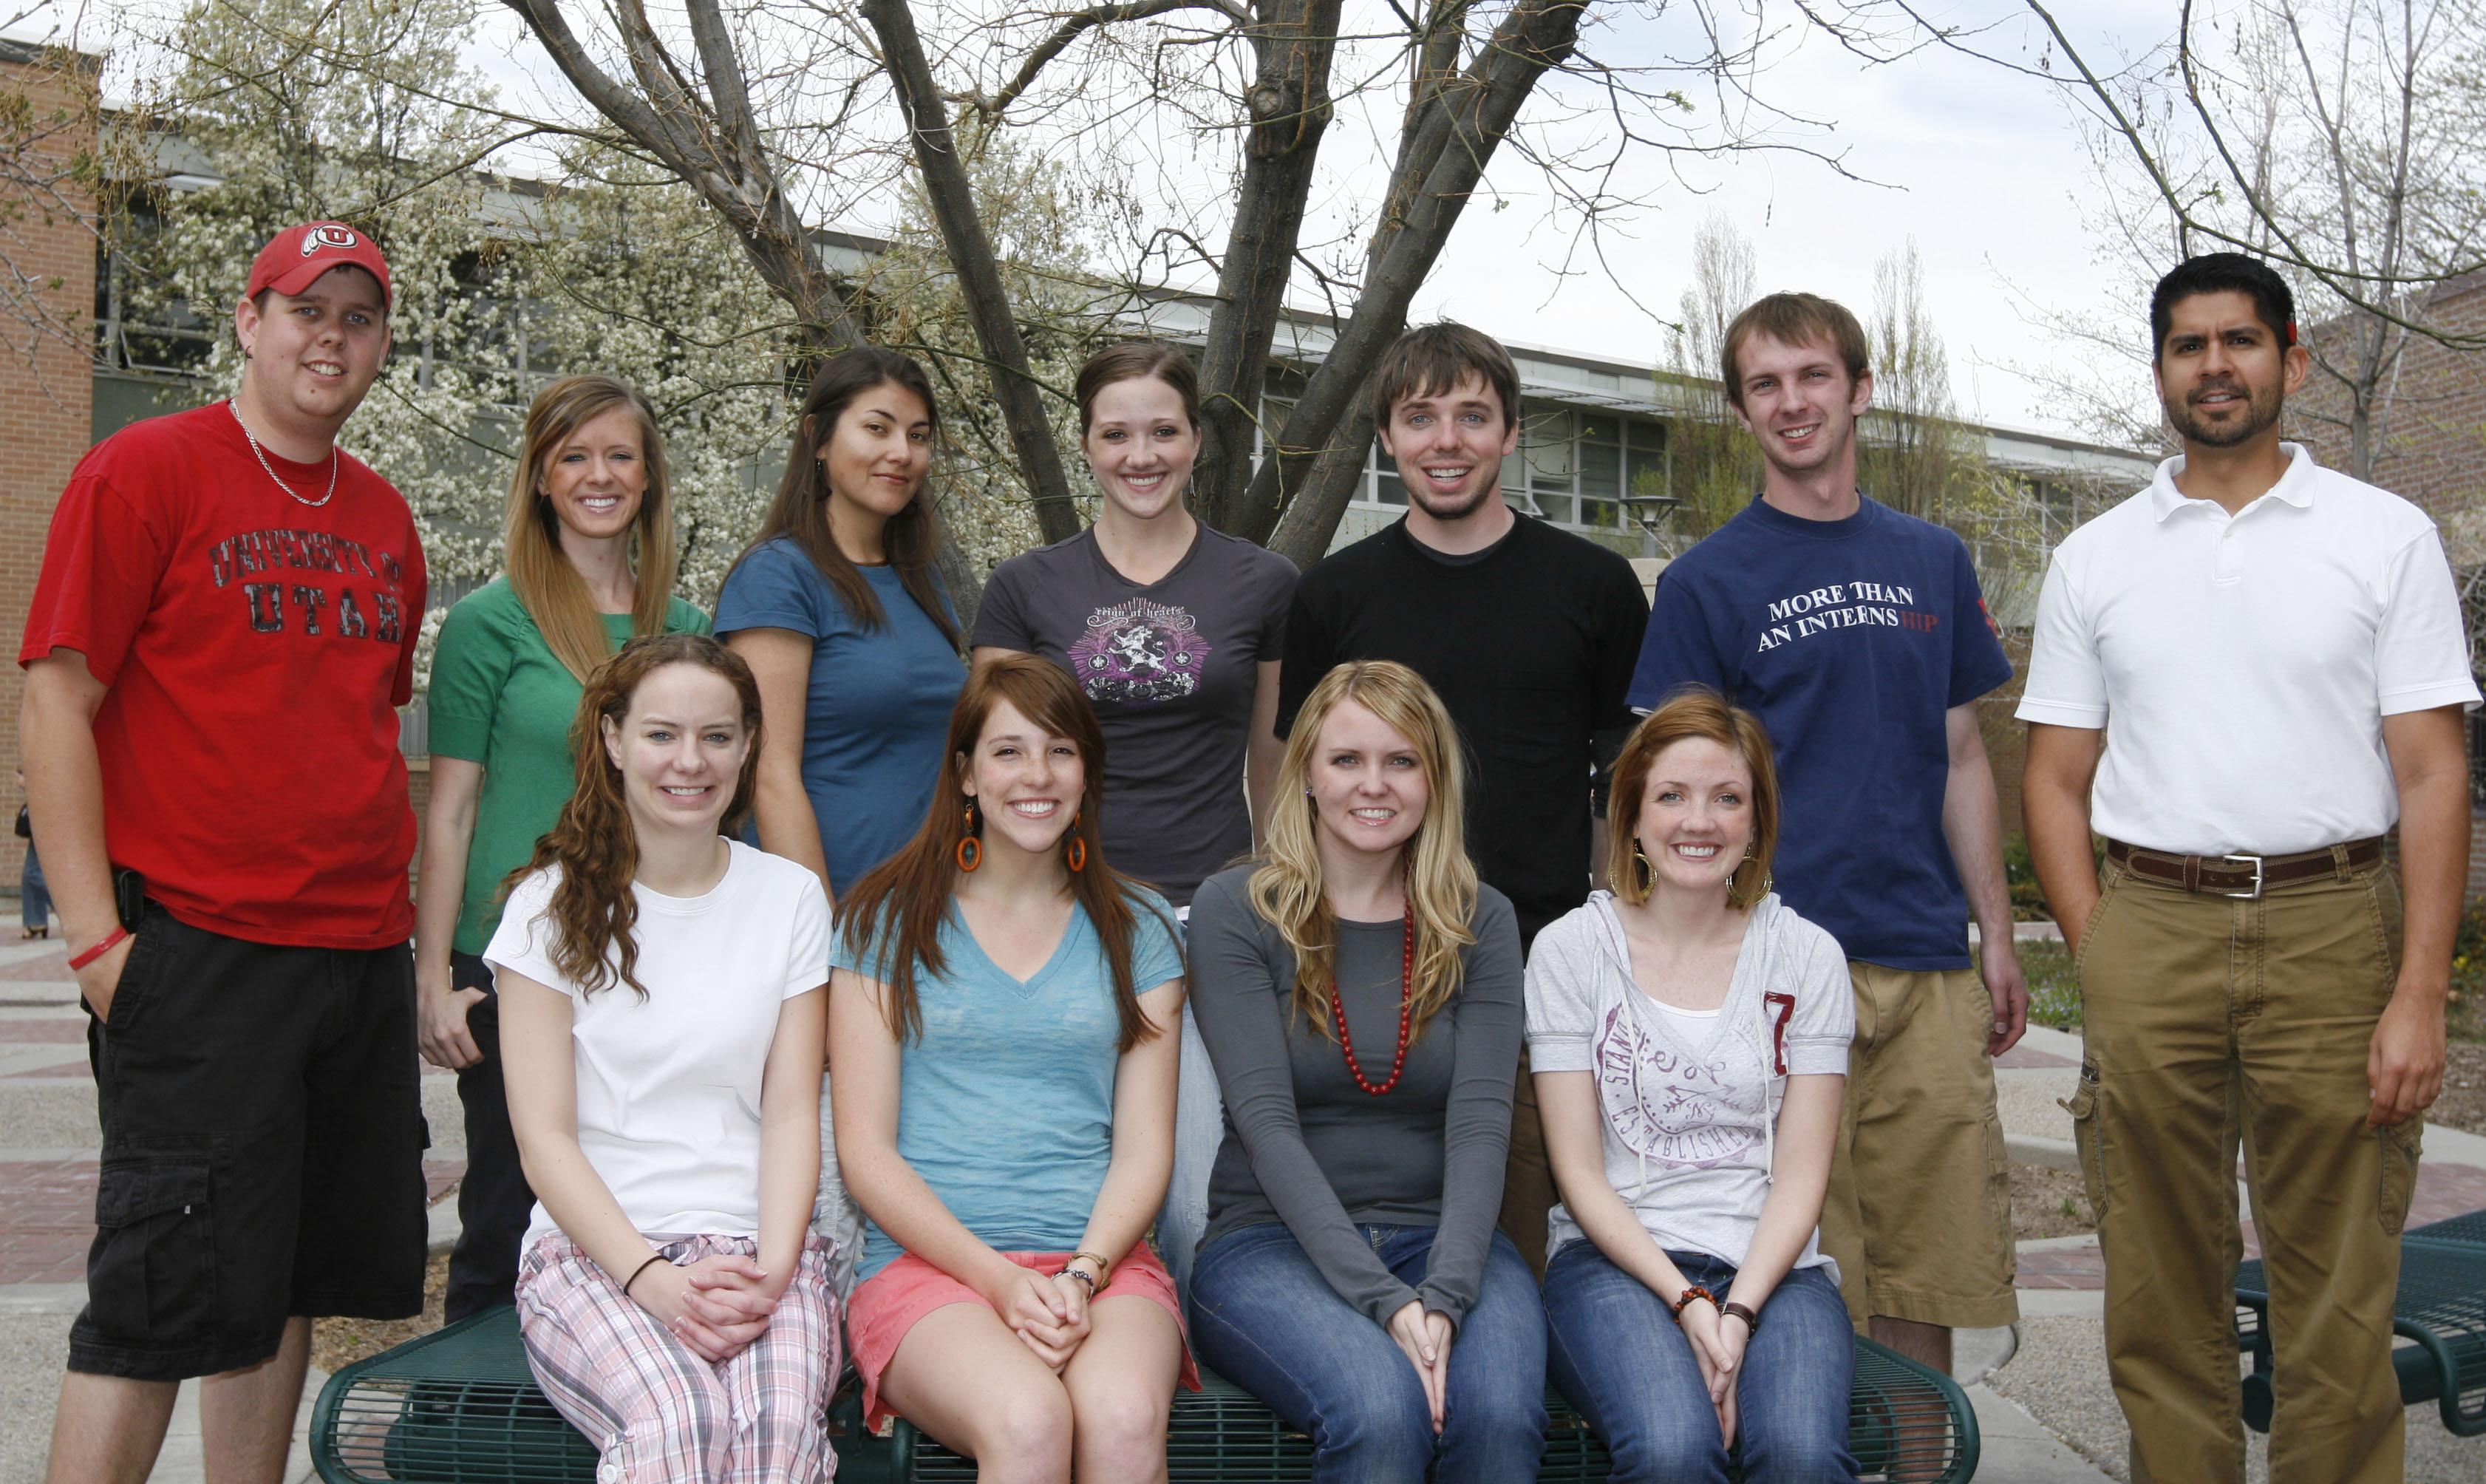 Back row, from left: Tyler Cobb; Madison Rice; Michelle Schmitt; Patrick Harrington; Jed Layton; Geoffrey Fattah. Front row, from left: Emily A. Showgren; Danielle Murphy; Paige Kasteler. Photo by Tyler Cobb.